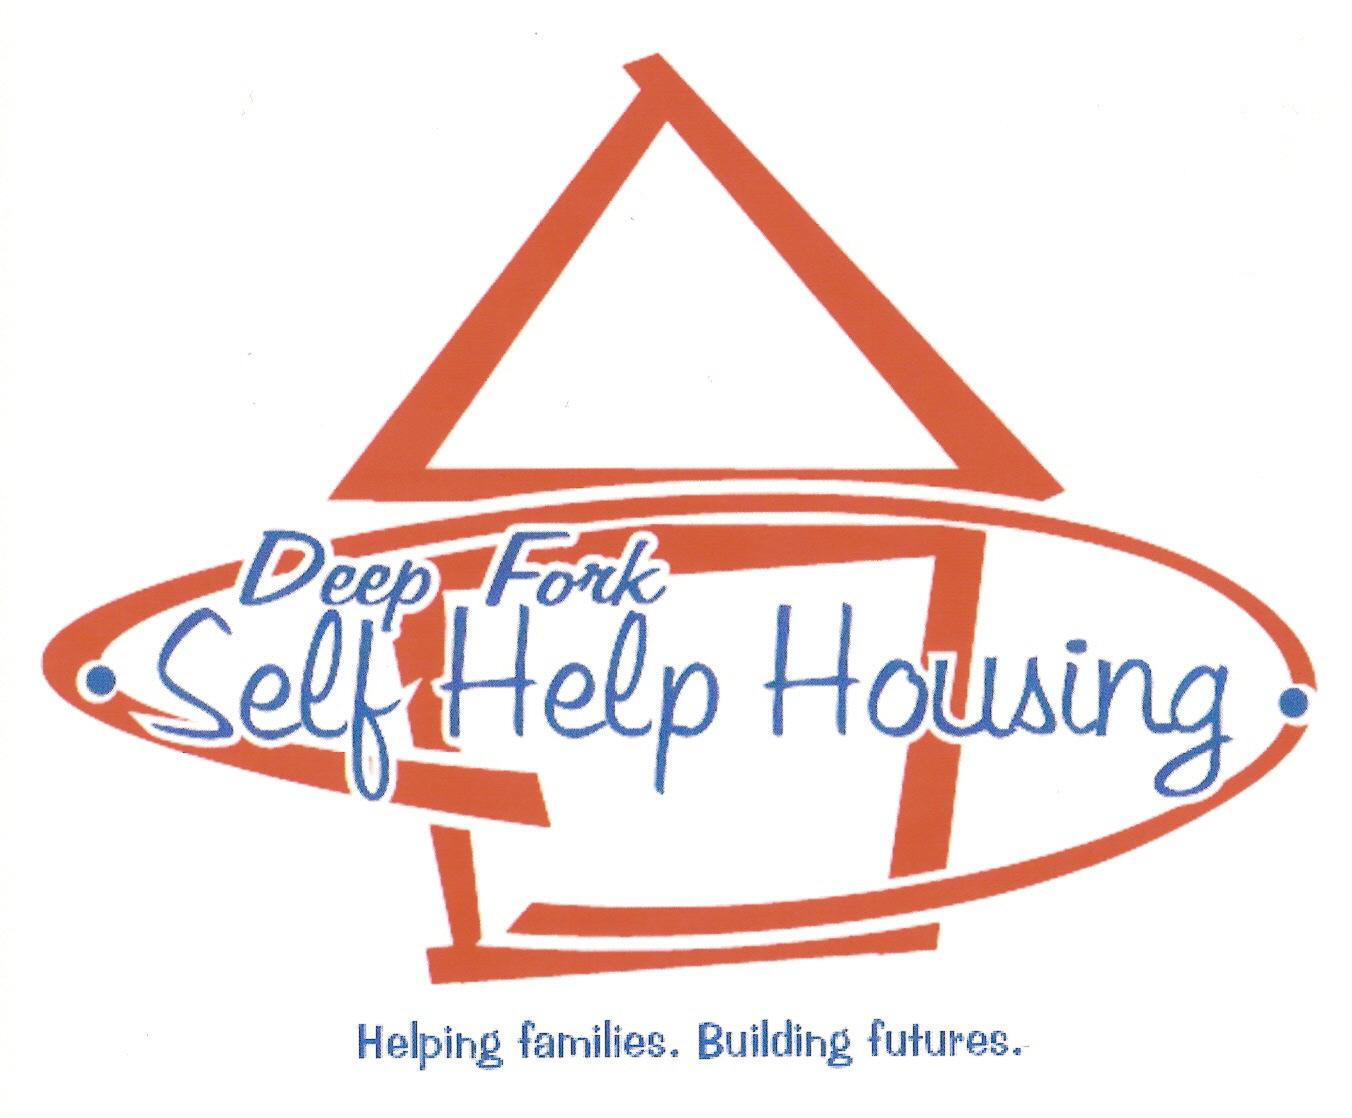 Deep Fork Self Help Housing Home